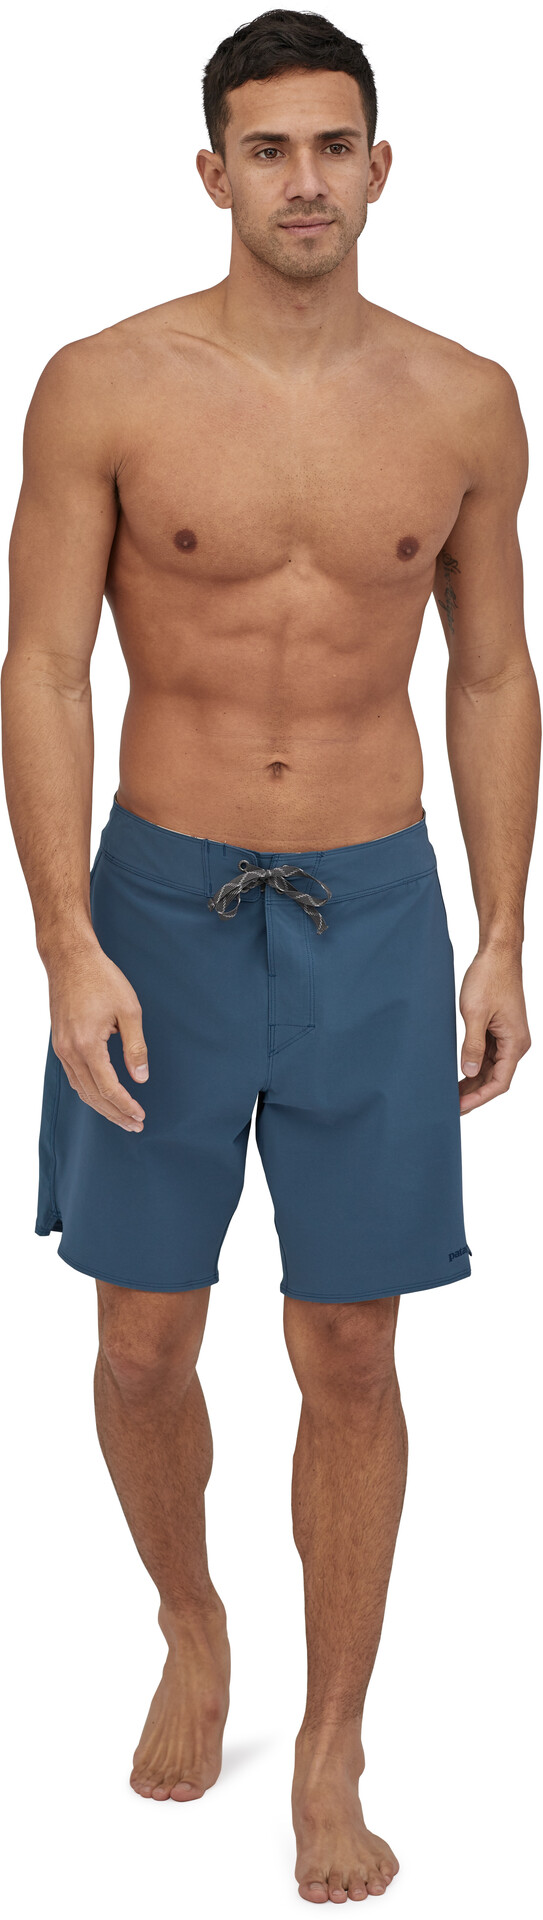 Patagonia Stretch hydropeak Costumi da bagno Coral Patagonia MEN/'S CLOTHING Pantaloncini